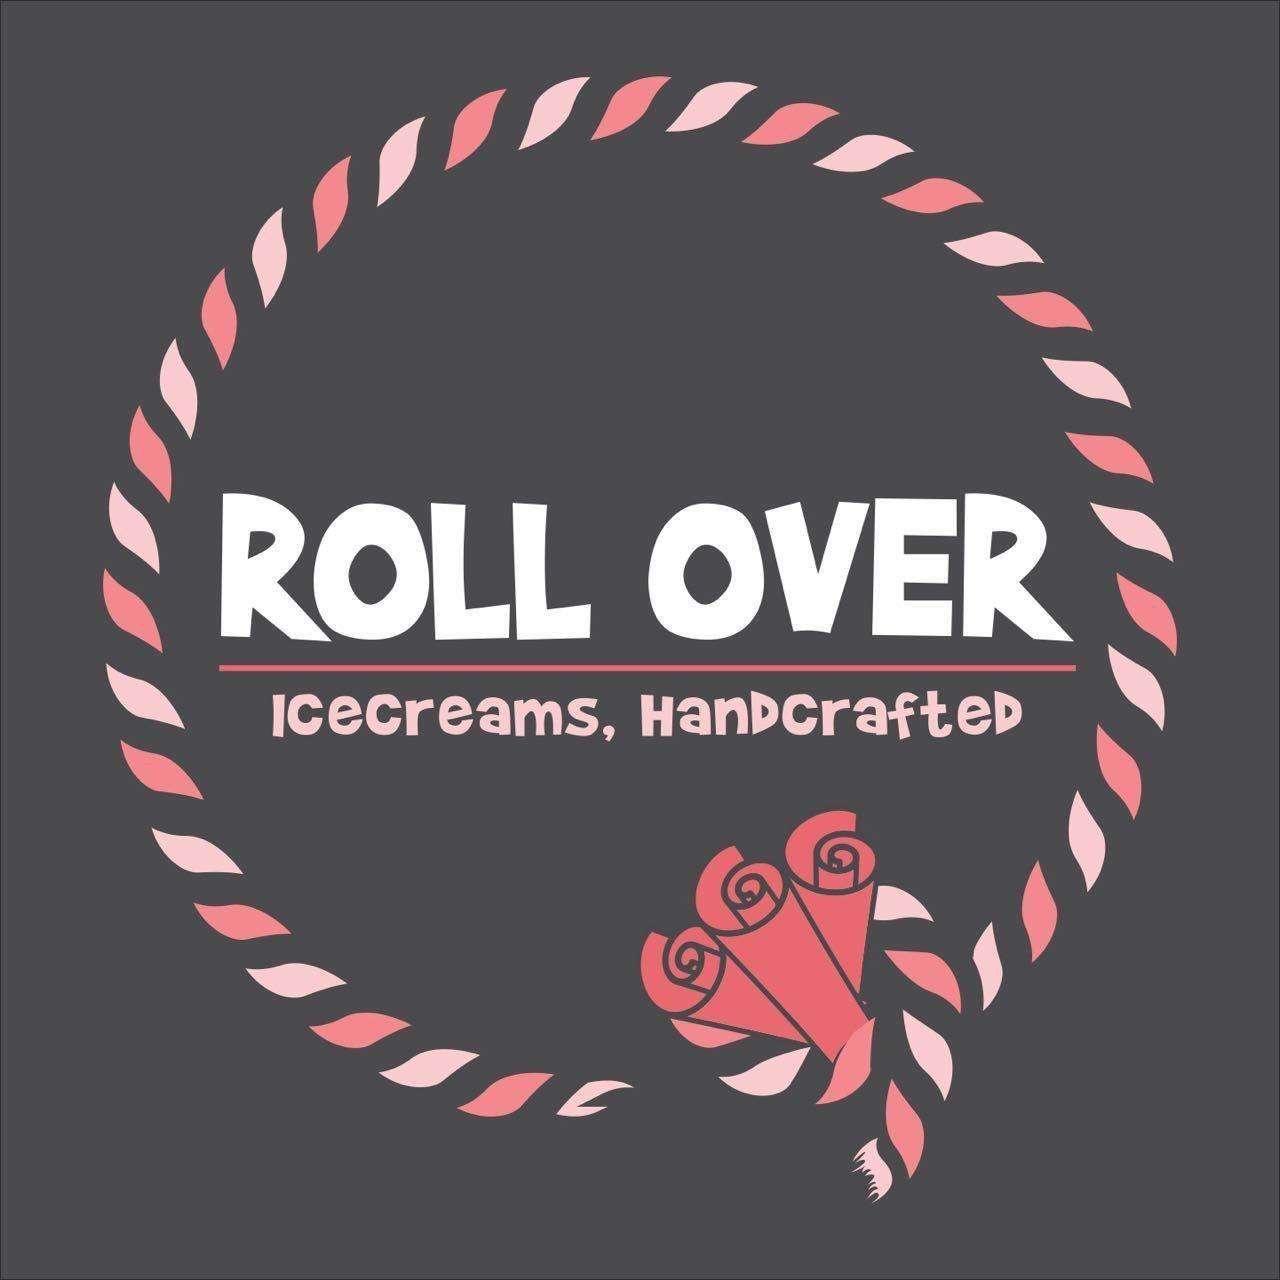 Rollover Icecream Handcrafted - Labbipet - Vijayawada Image